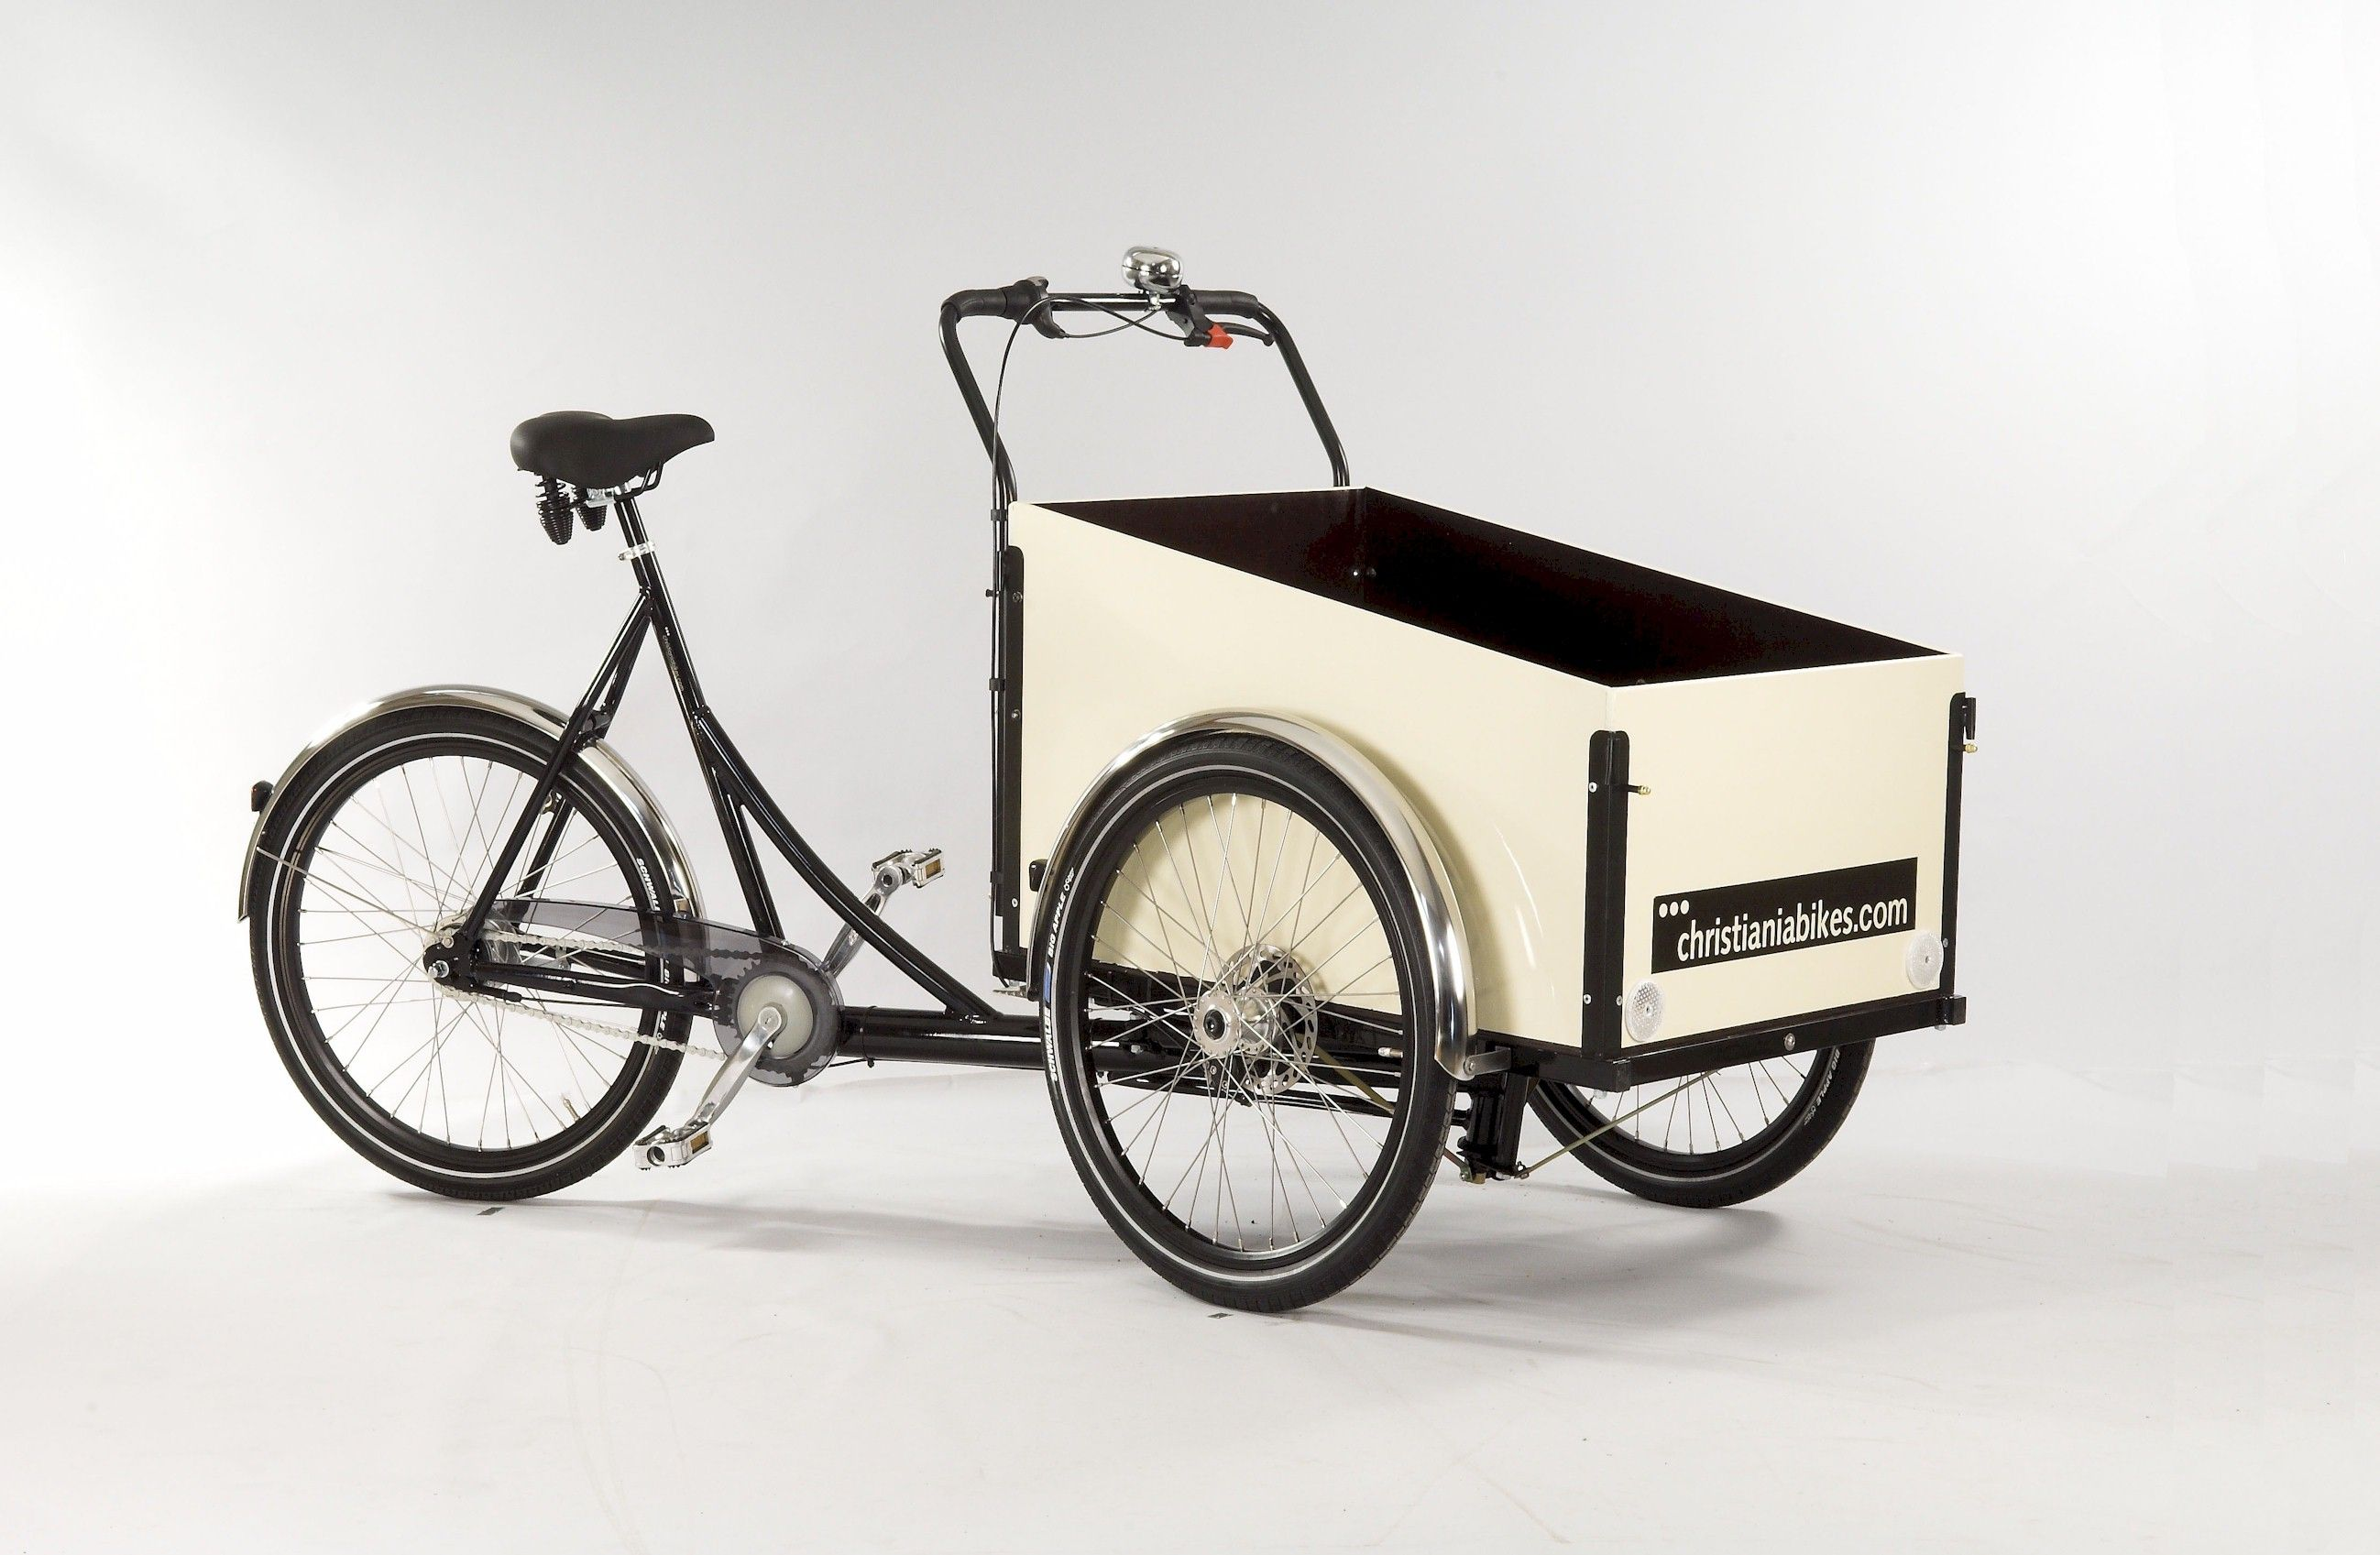 Christiania Bikes Made In Christiania Denmark Design